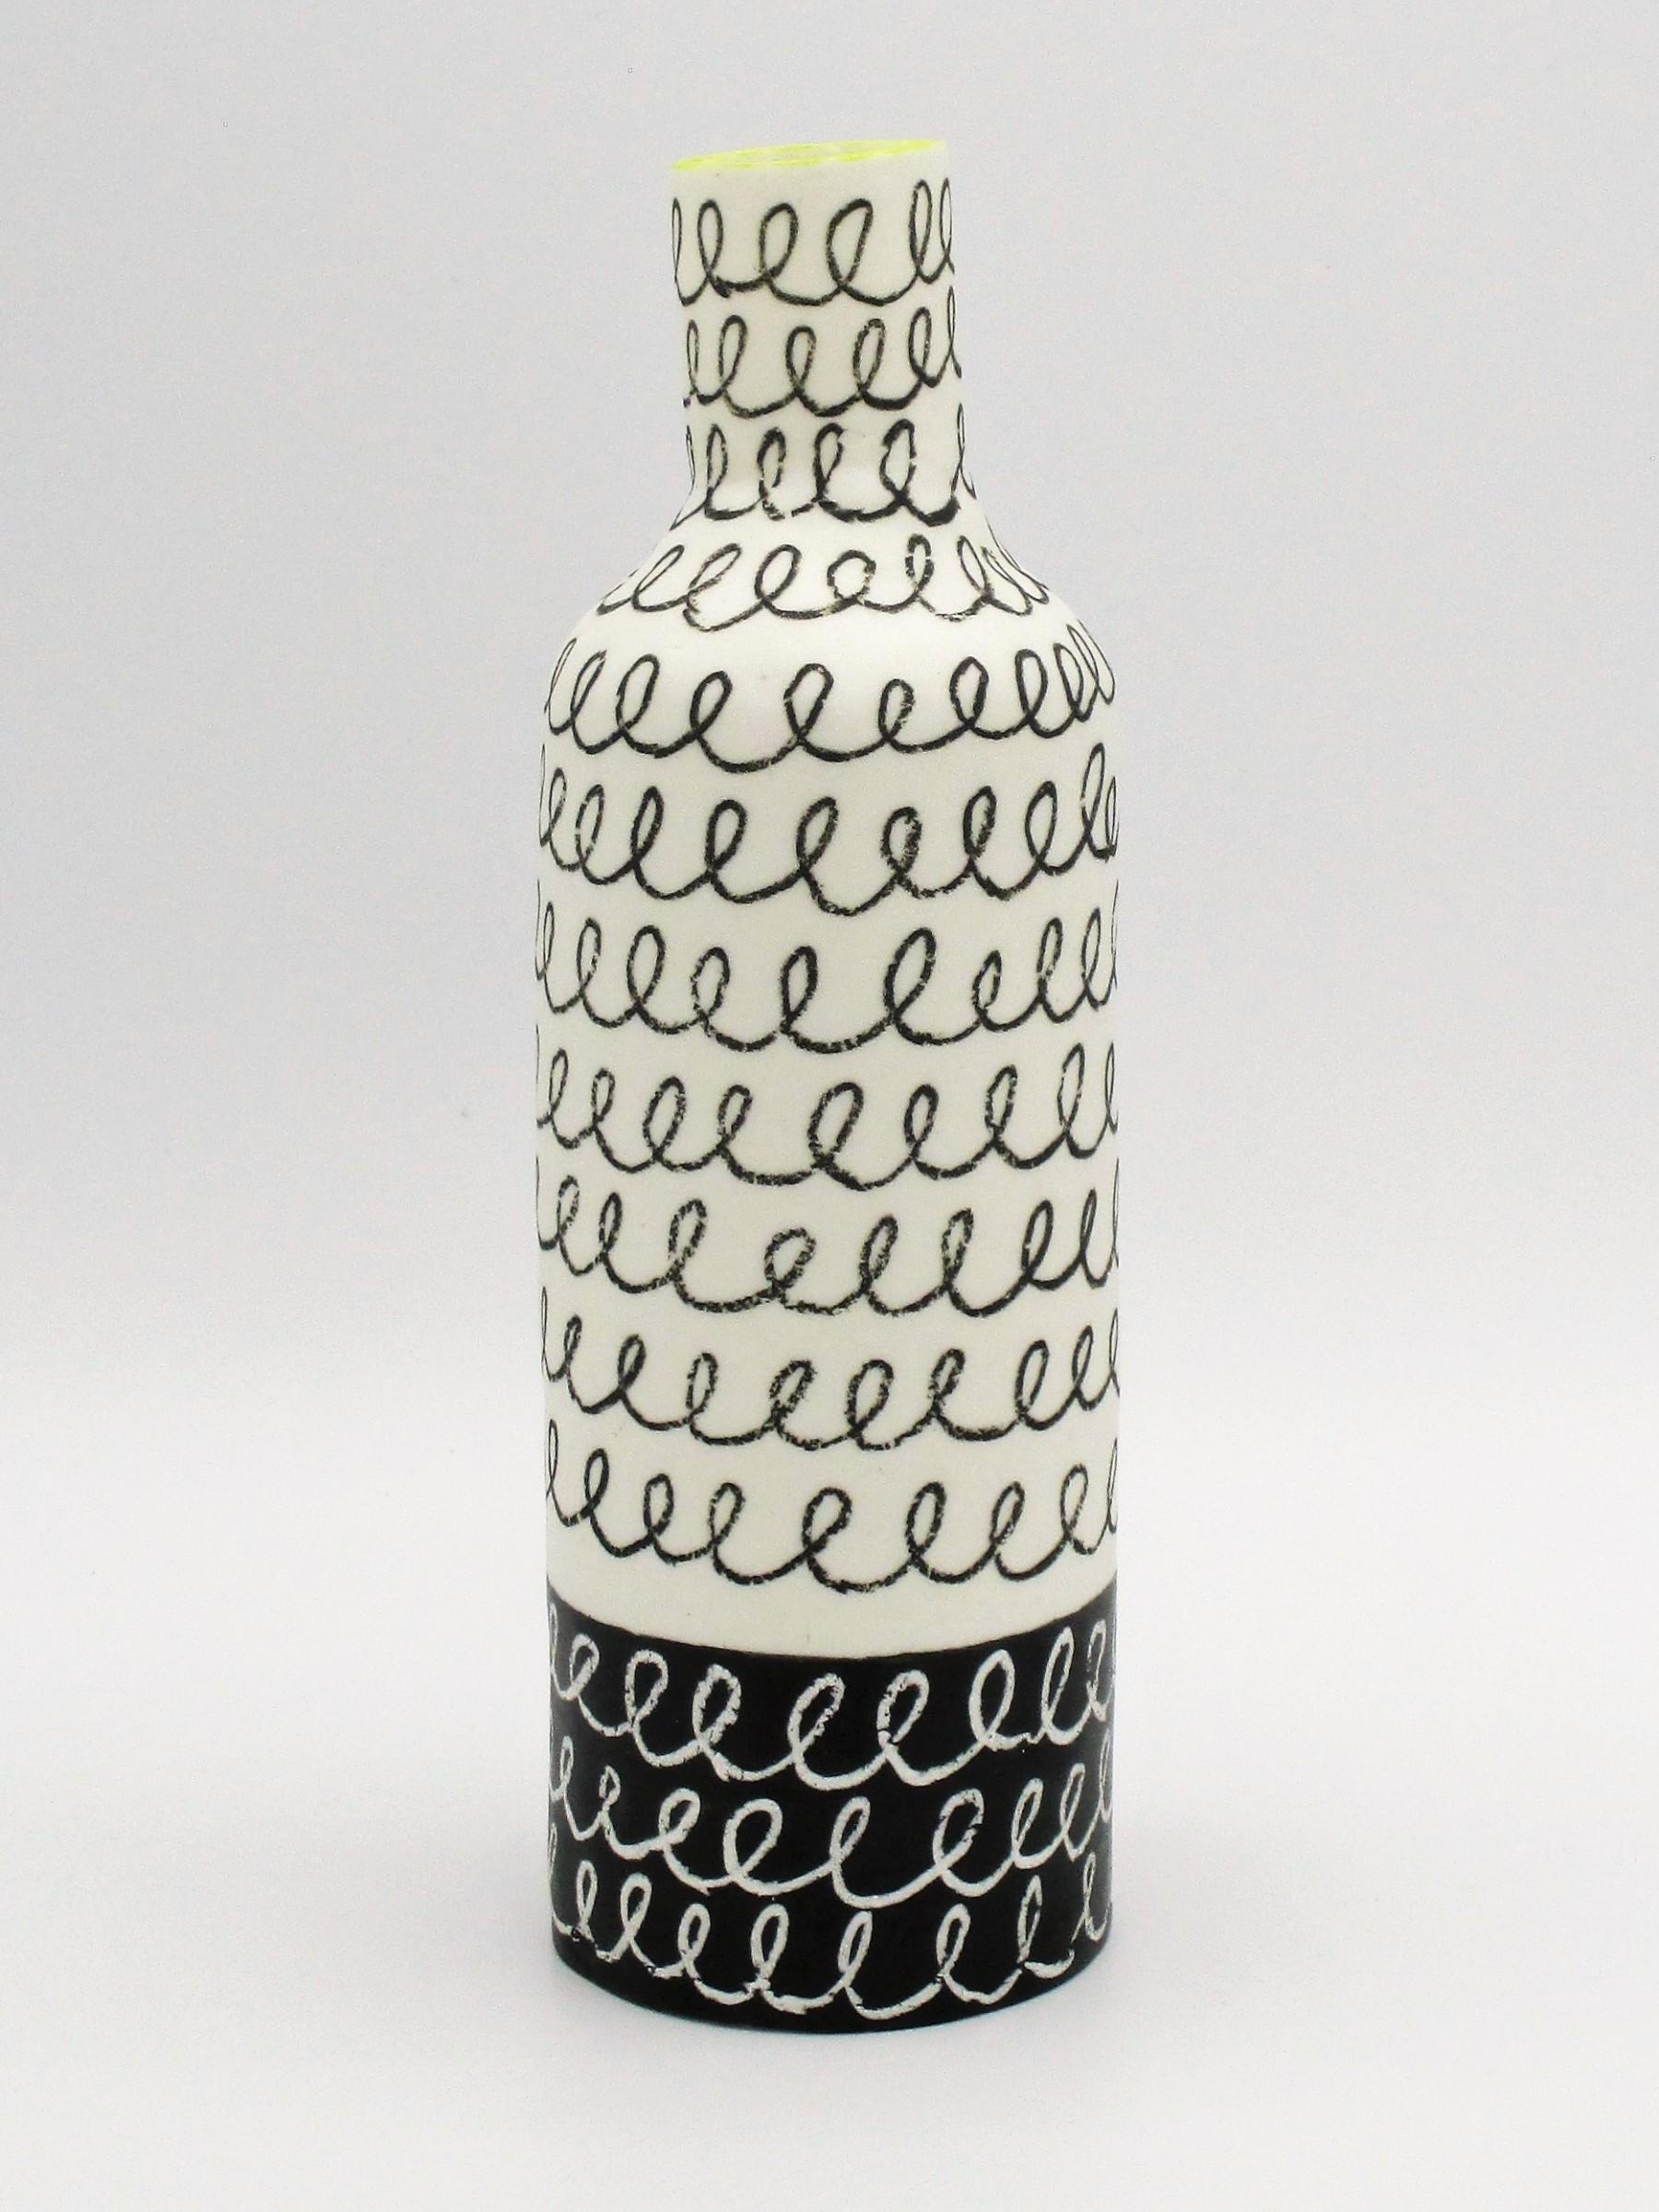 "<span class=""link fancybox-details-link""><a href=""/artists/226-jane-muende/works/7162-jane-muende-high-shoulder-bottle-blalck-white-with-contrasting-2020/"">View Detail Page</a></span><div class=""artist""><strong>Jane Muende</strong></div> <div class=""title""><em>High shoulder bottle, blalck & white with contrasting helter skelter lines, lime green rim</em>, 2020</div> <div class=""medium"">Hand built in paper porcelain</div> <div class=""dimensions"">20 cm x 6 cm </div><div class=""price"">£210.00</div><div class=""copyright_line"">Own Art: £21 x 10 months 0% APR</div>"